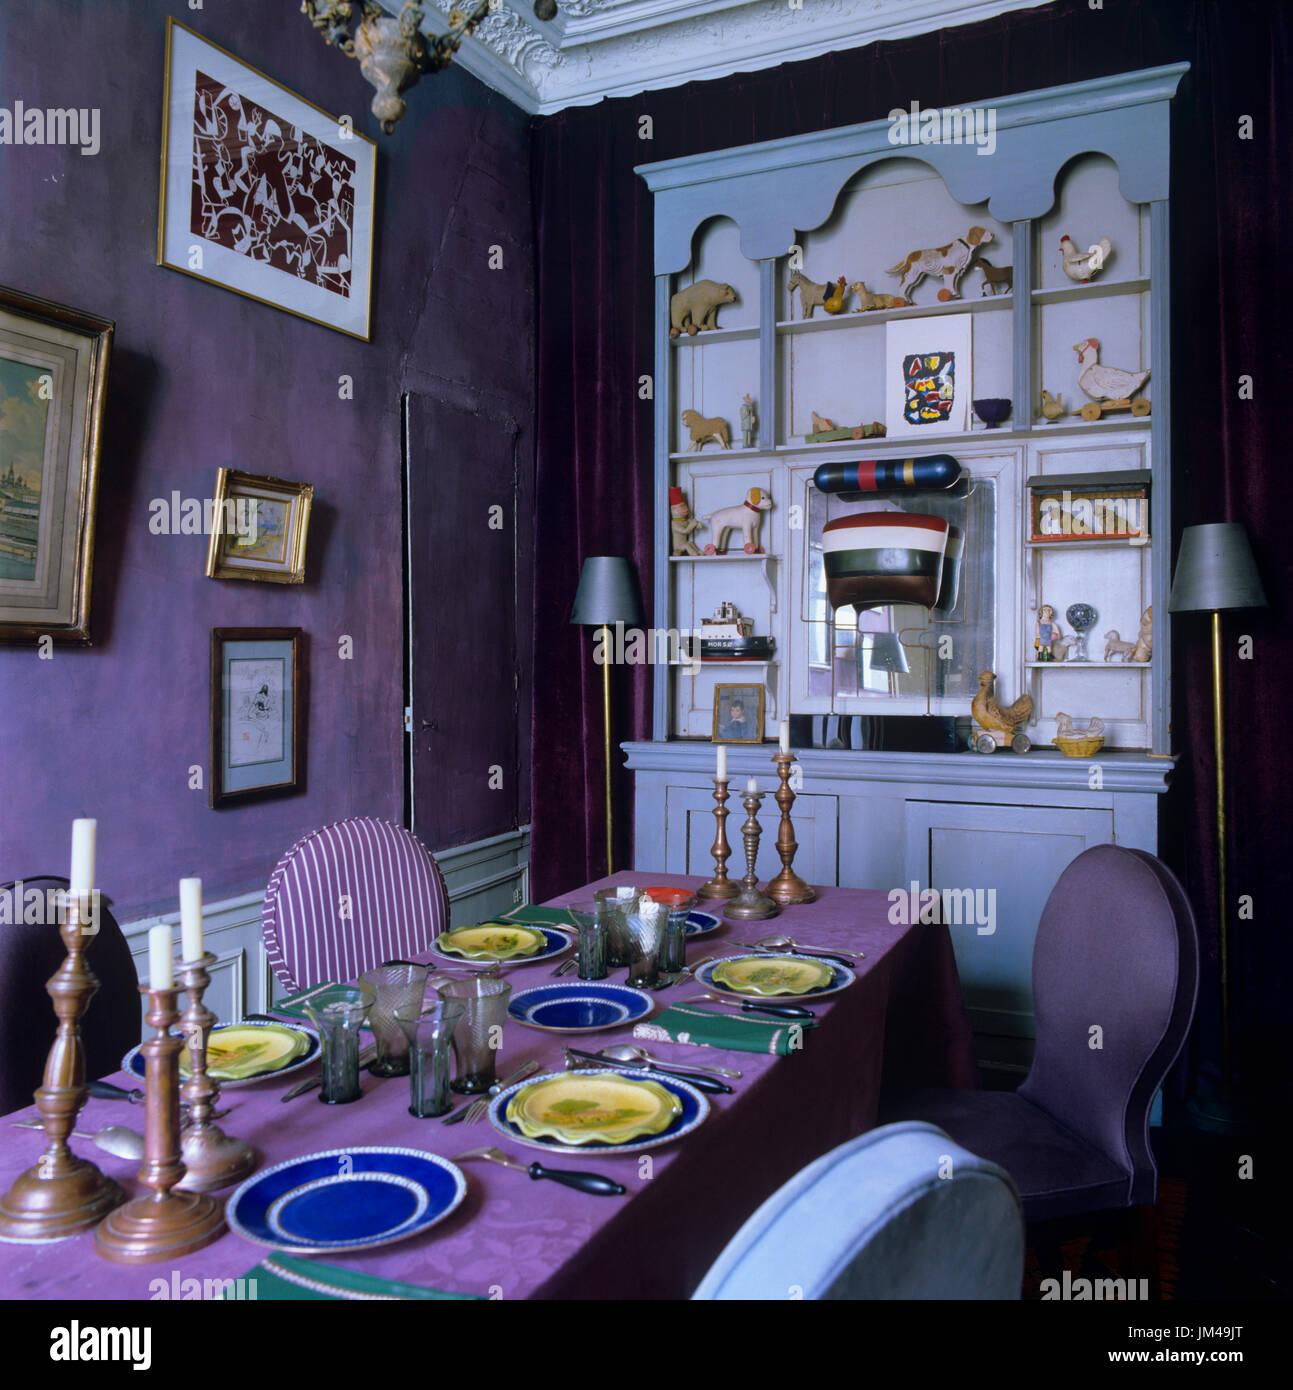 Dramatic Purple Dining Room   Stock Image